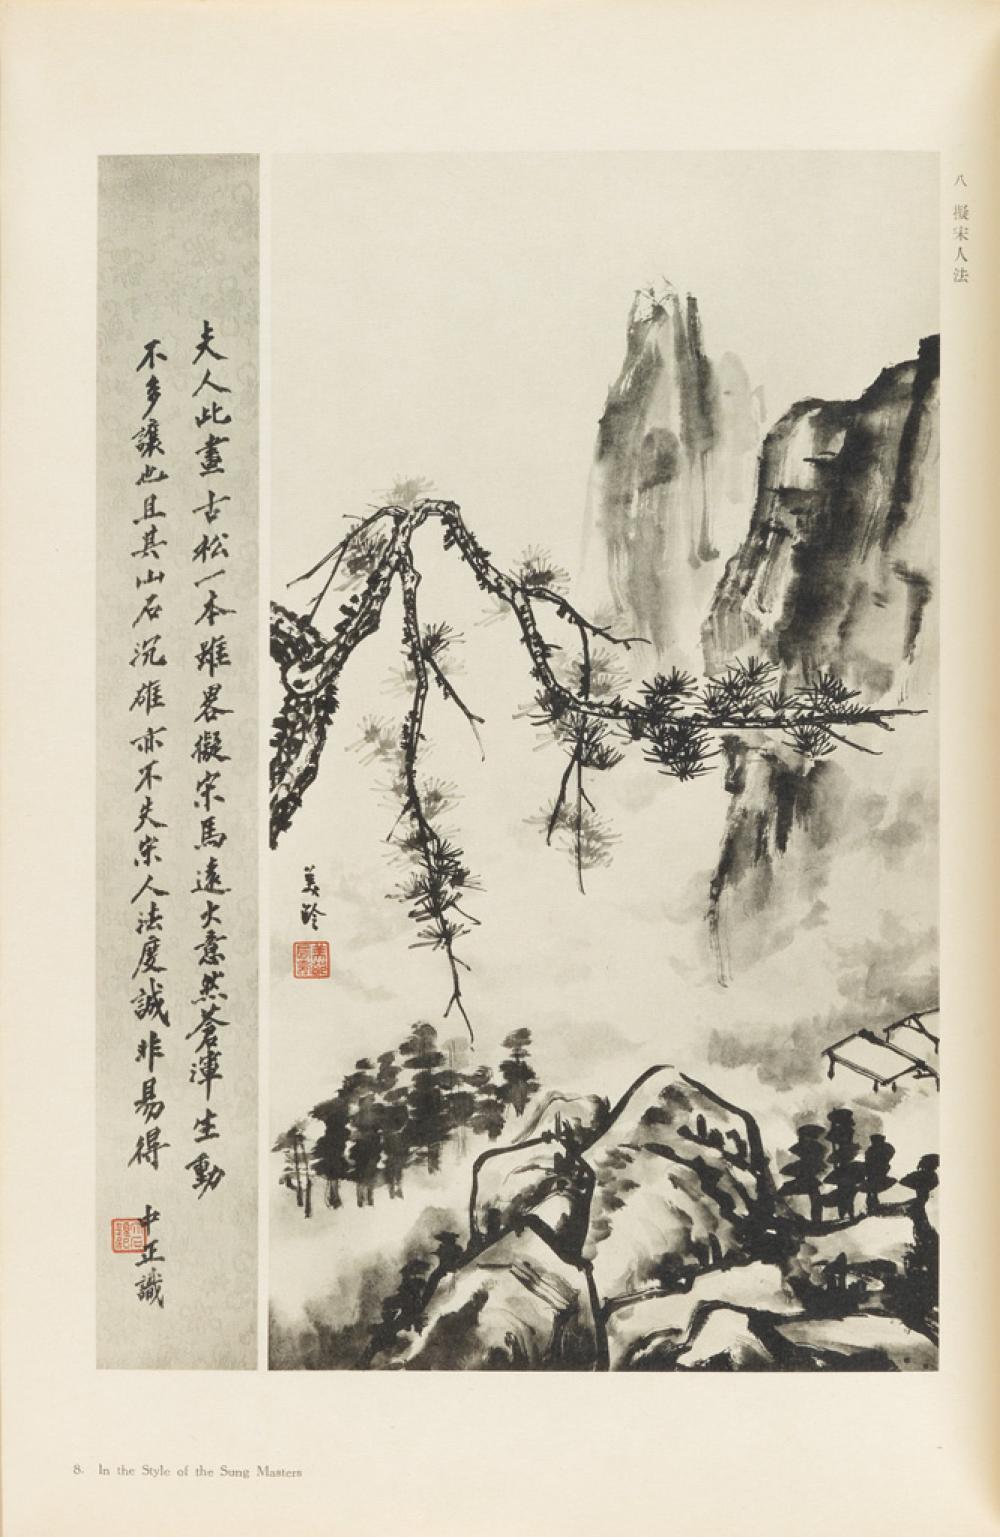 (CHINESE ART.) Paintings by Madame Chiang Kai-Shek. Volume 1.